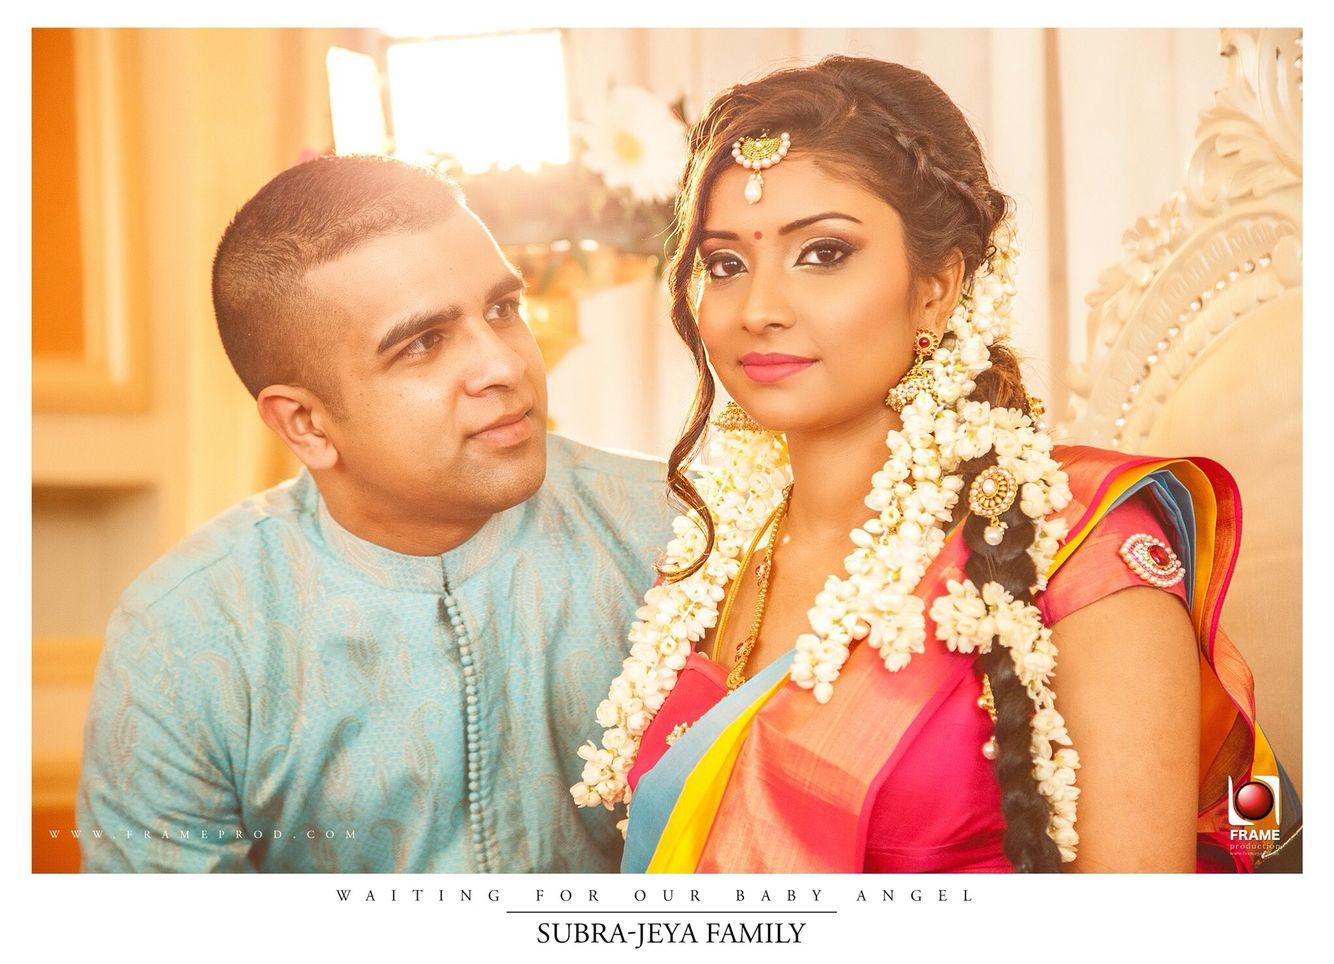 Indianlook Makeup Valaikappu Patthu Saree Hair Styles Indian Baby Showers Indian Baby